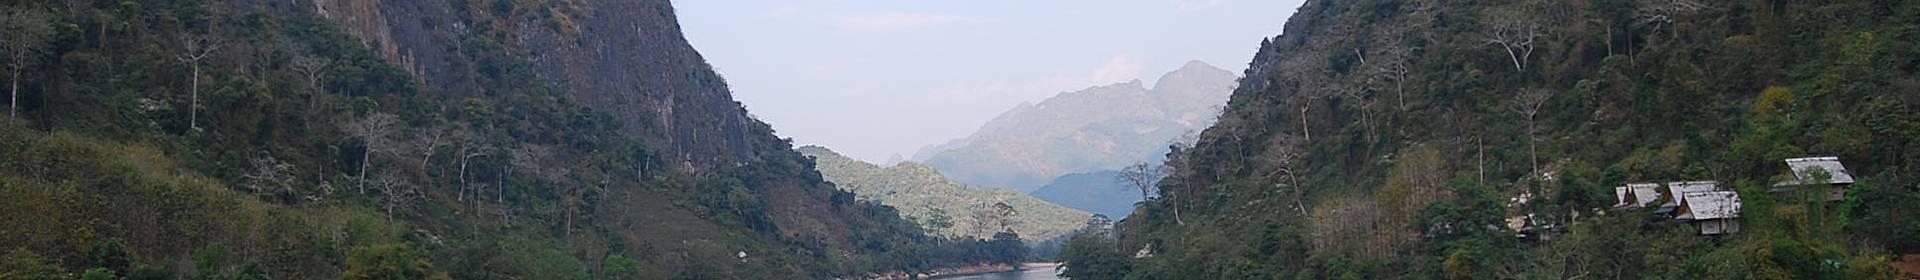 Nong-Khiaw